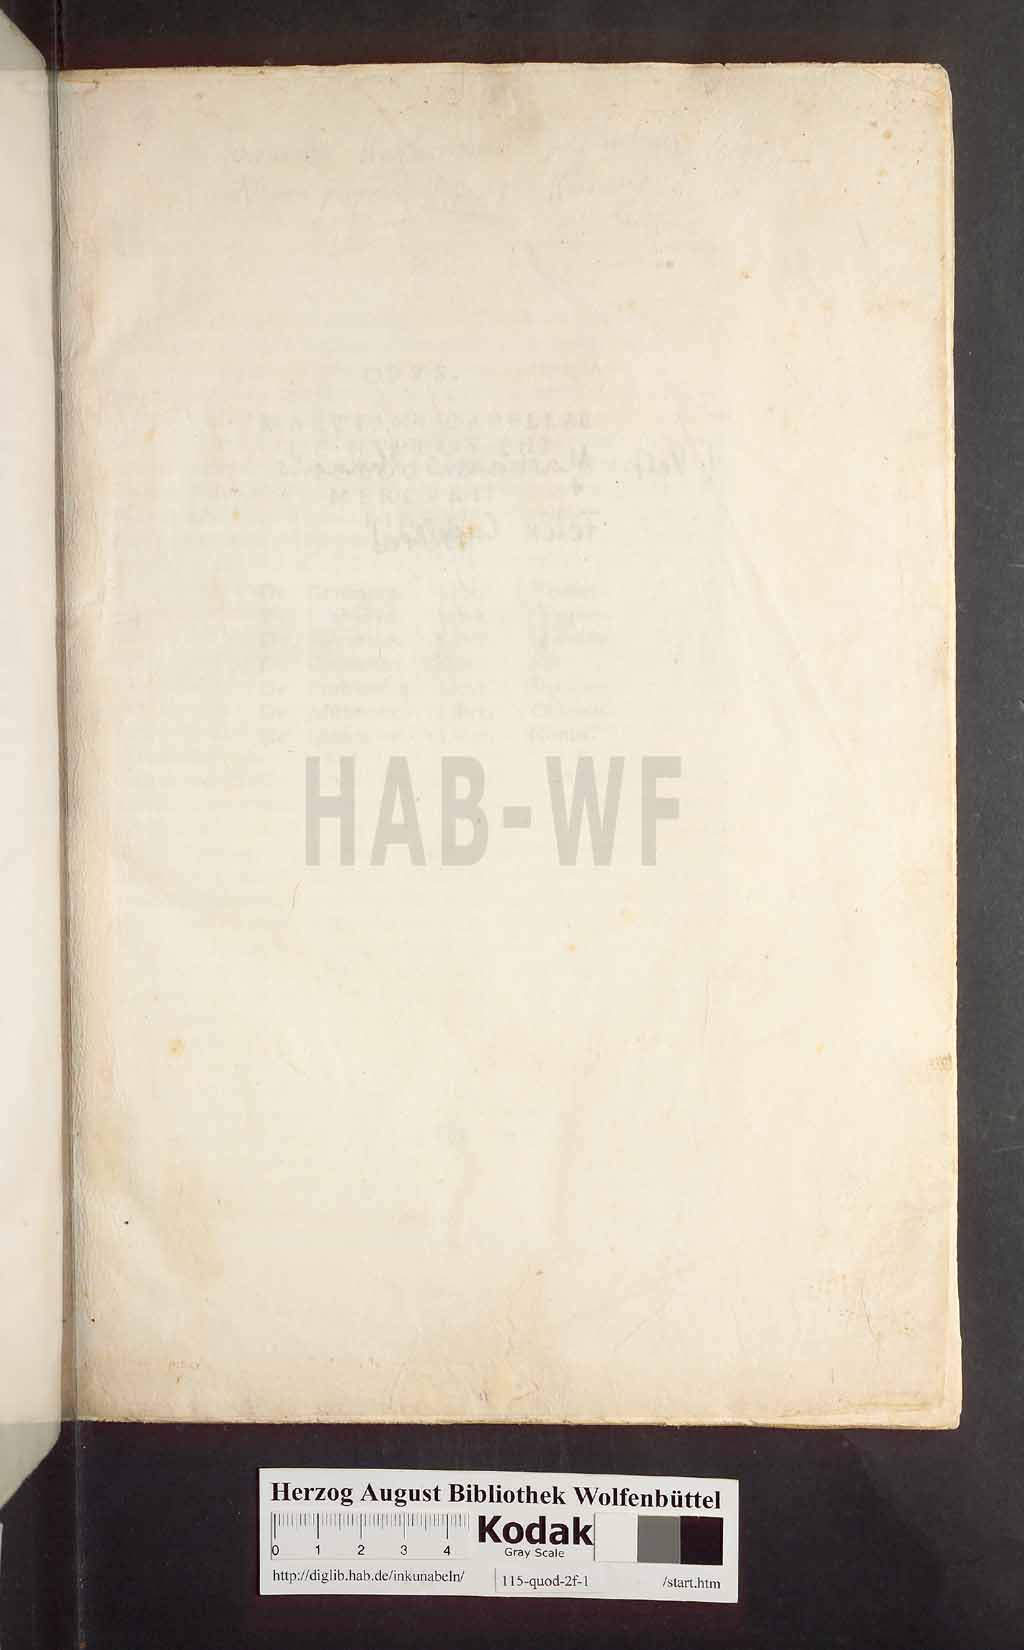 https://diglib.hab.de/inkunabeln/115-quod-2f-1/00001.jpg